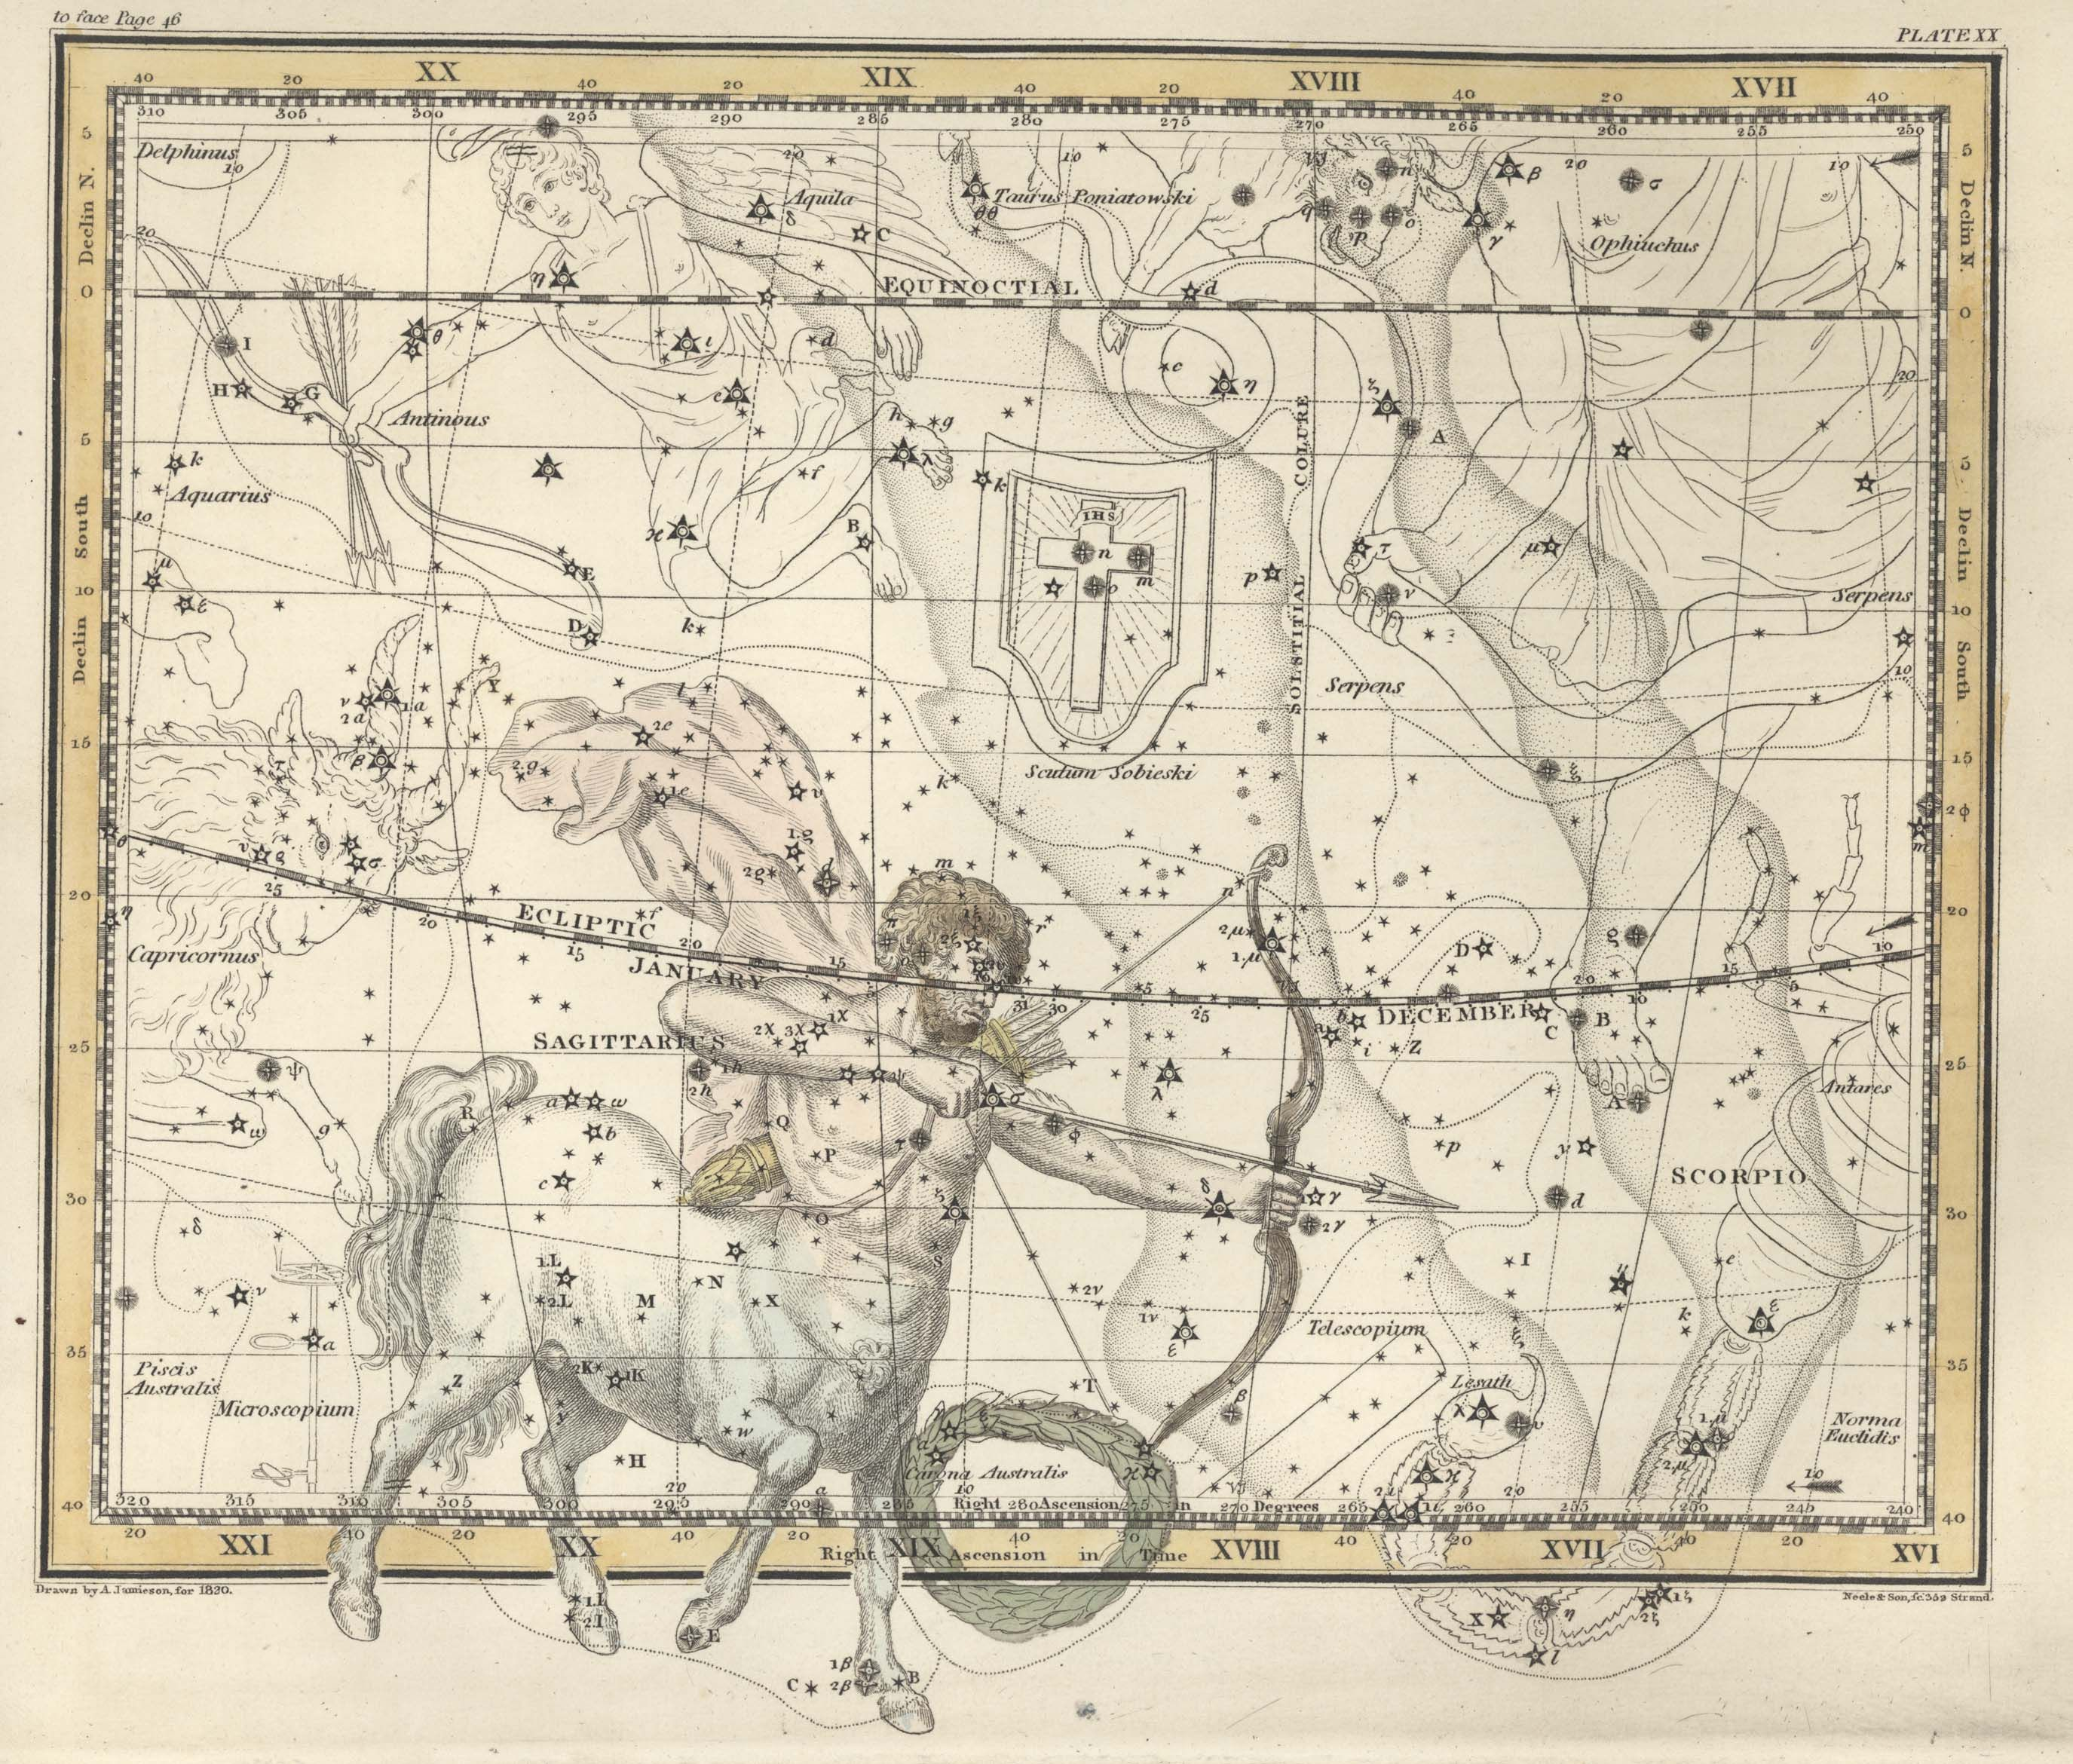 Alexander Jamieson Celestial Atlas 1822 Plate 20 Sagittarius Corona Australis Constellations Constellations Antique Maps Constellation Print